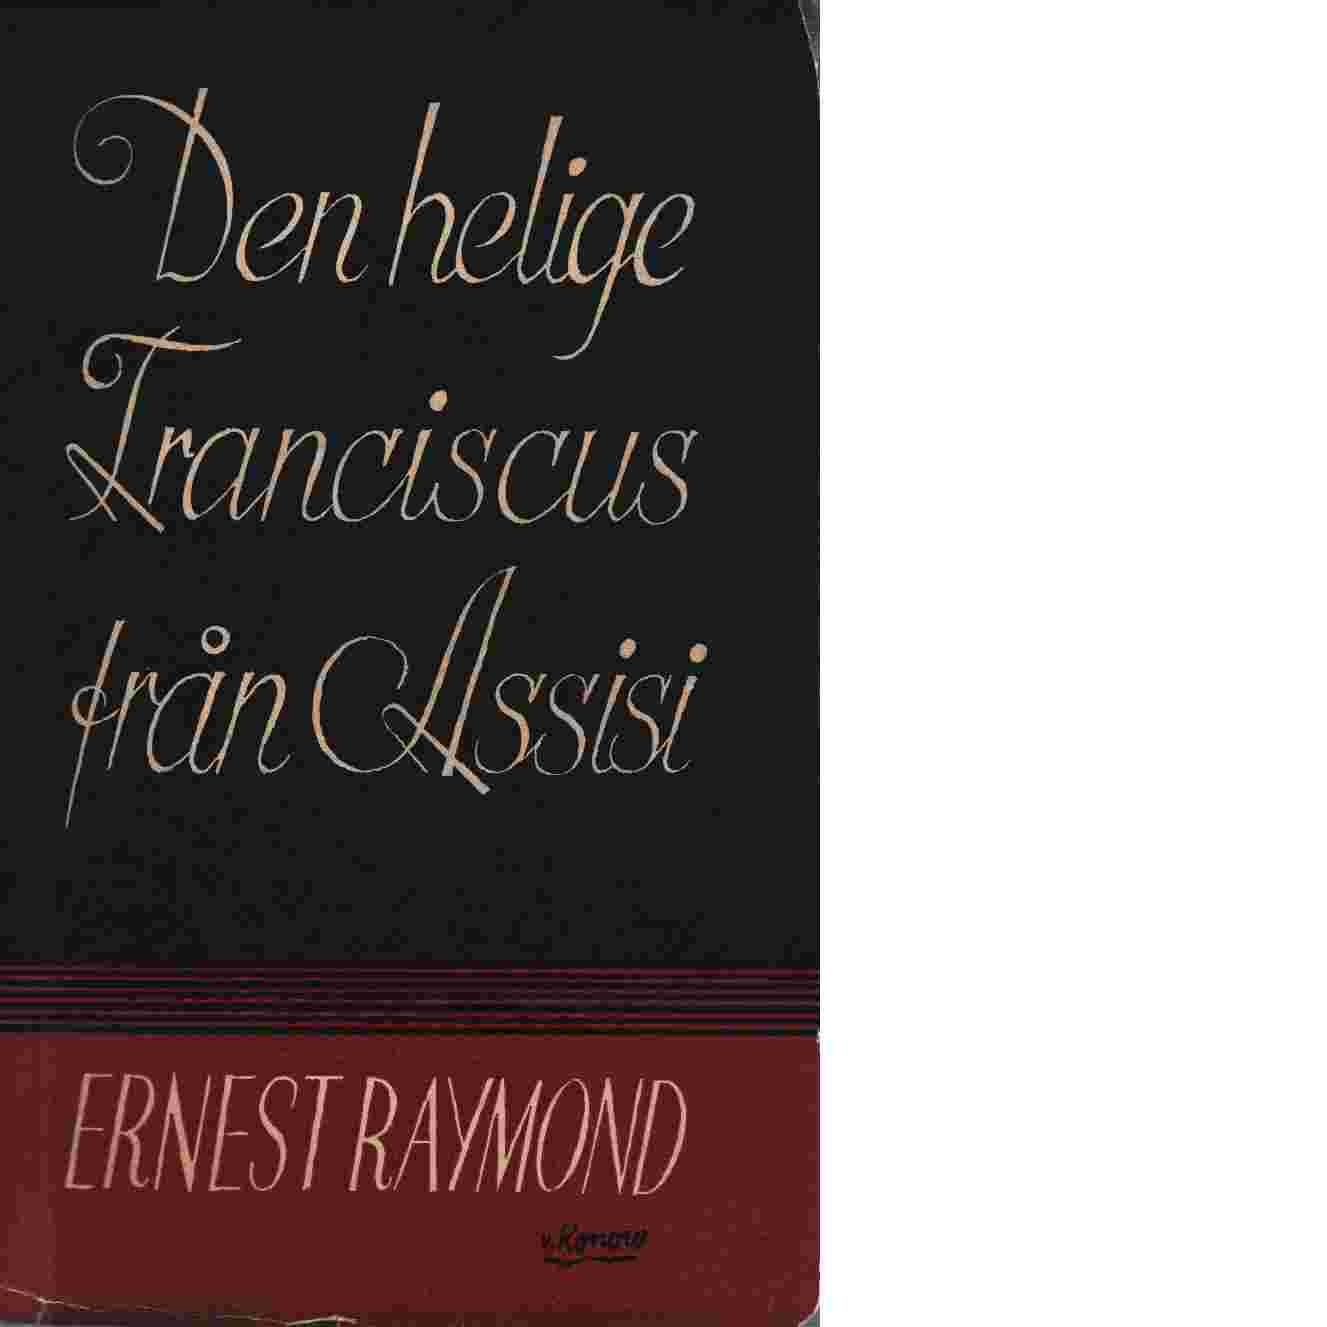 Den helige Franciscus från Assisi - Raymond, Ernest